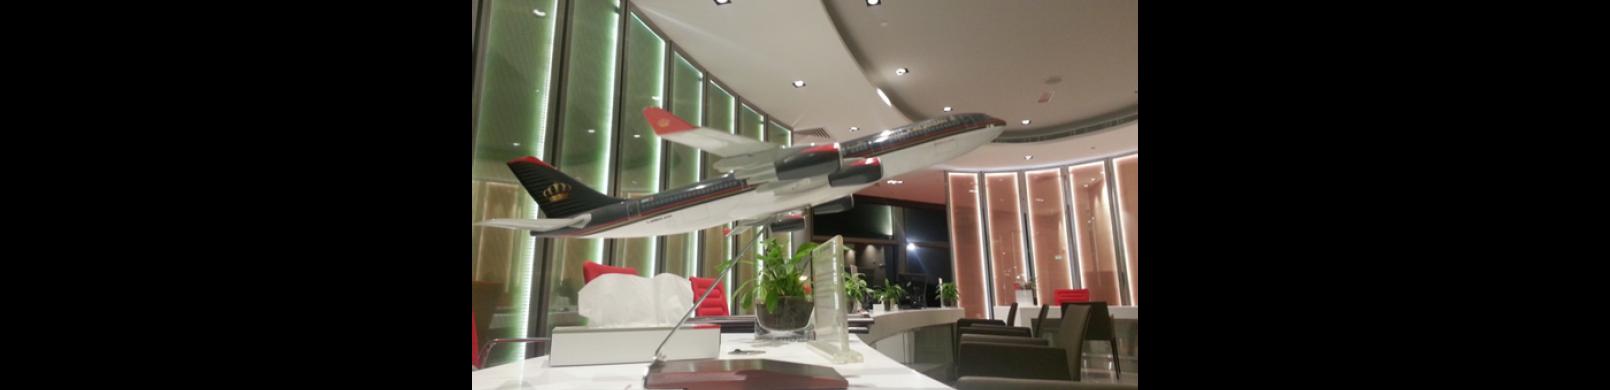 Art Line Qatar : Royal jordanian crown lounge and cip artline